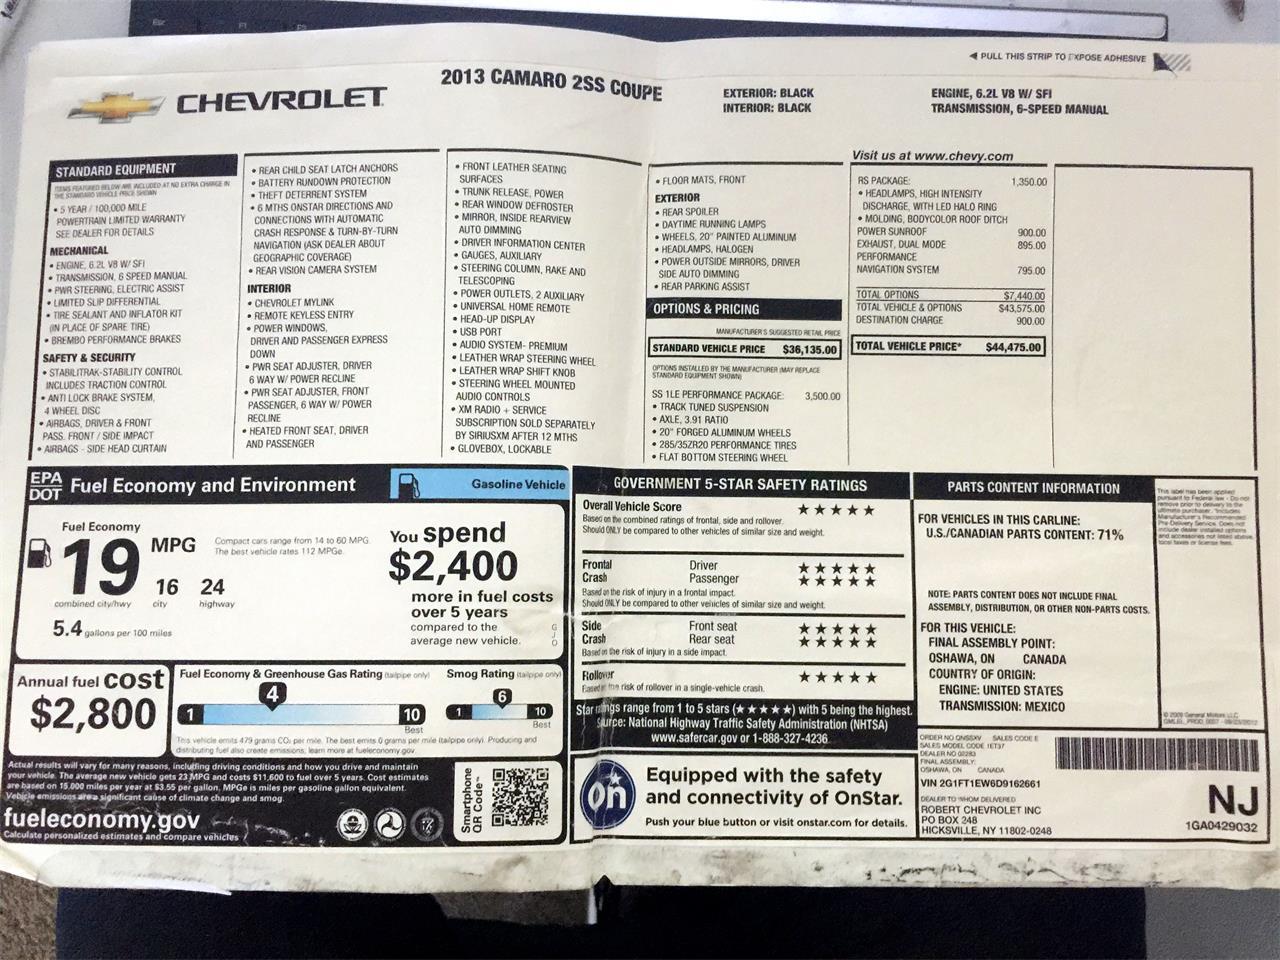 2013 Chevrolet Camaro SS (CC-1070422) for sale in Sarasota, Florida